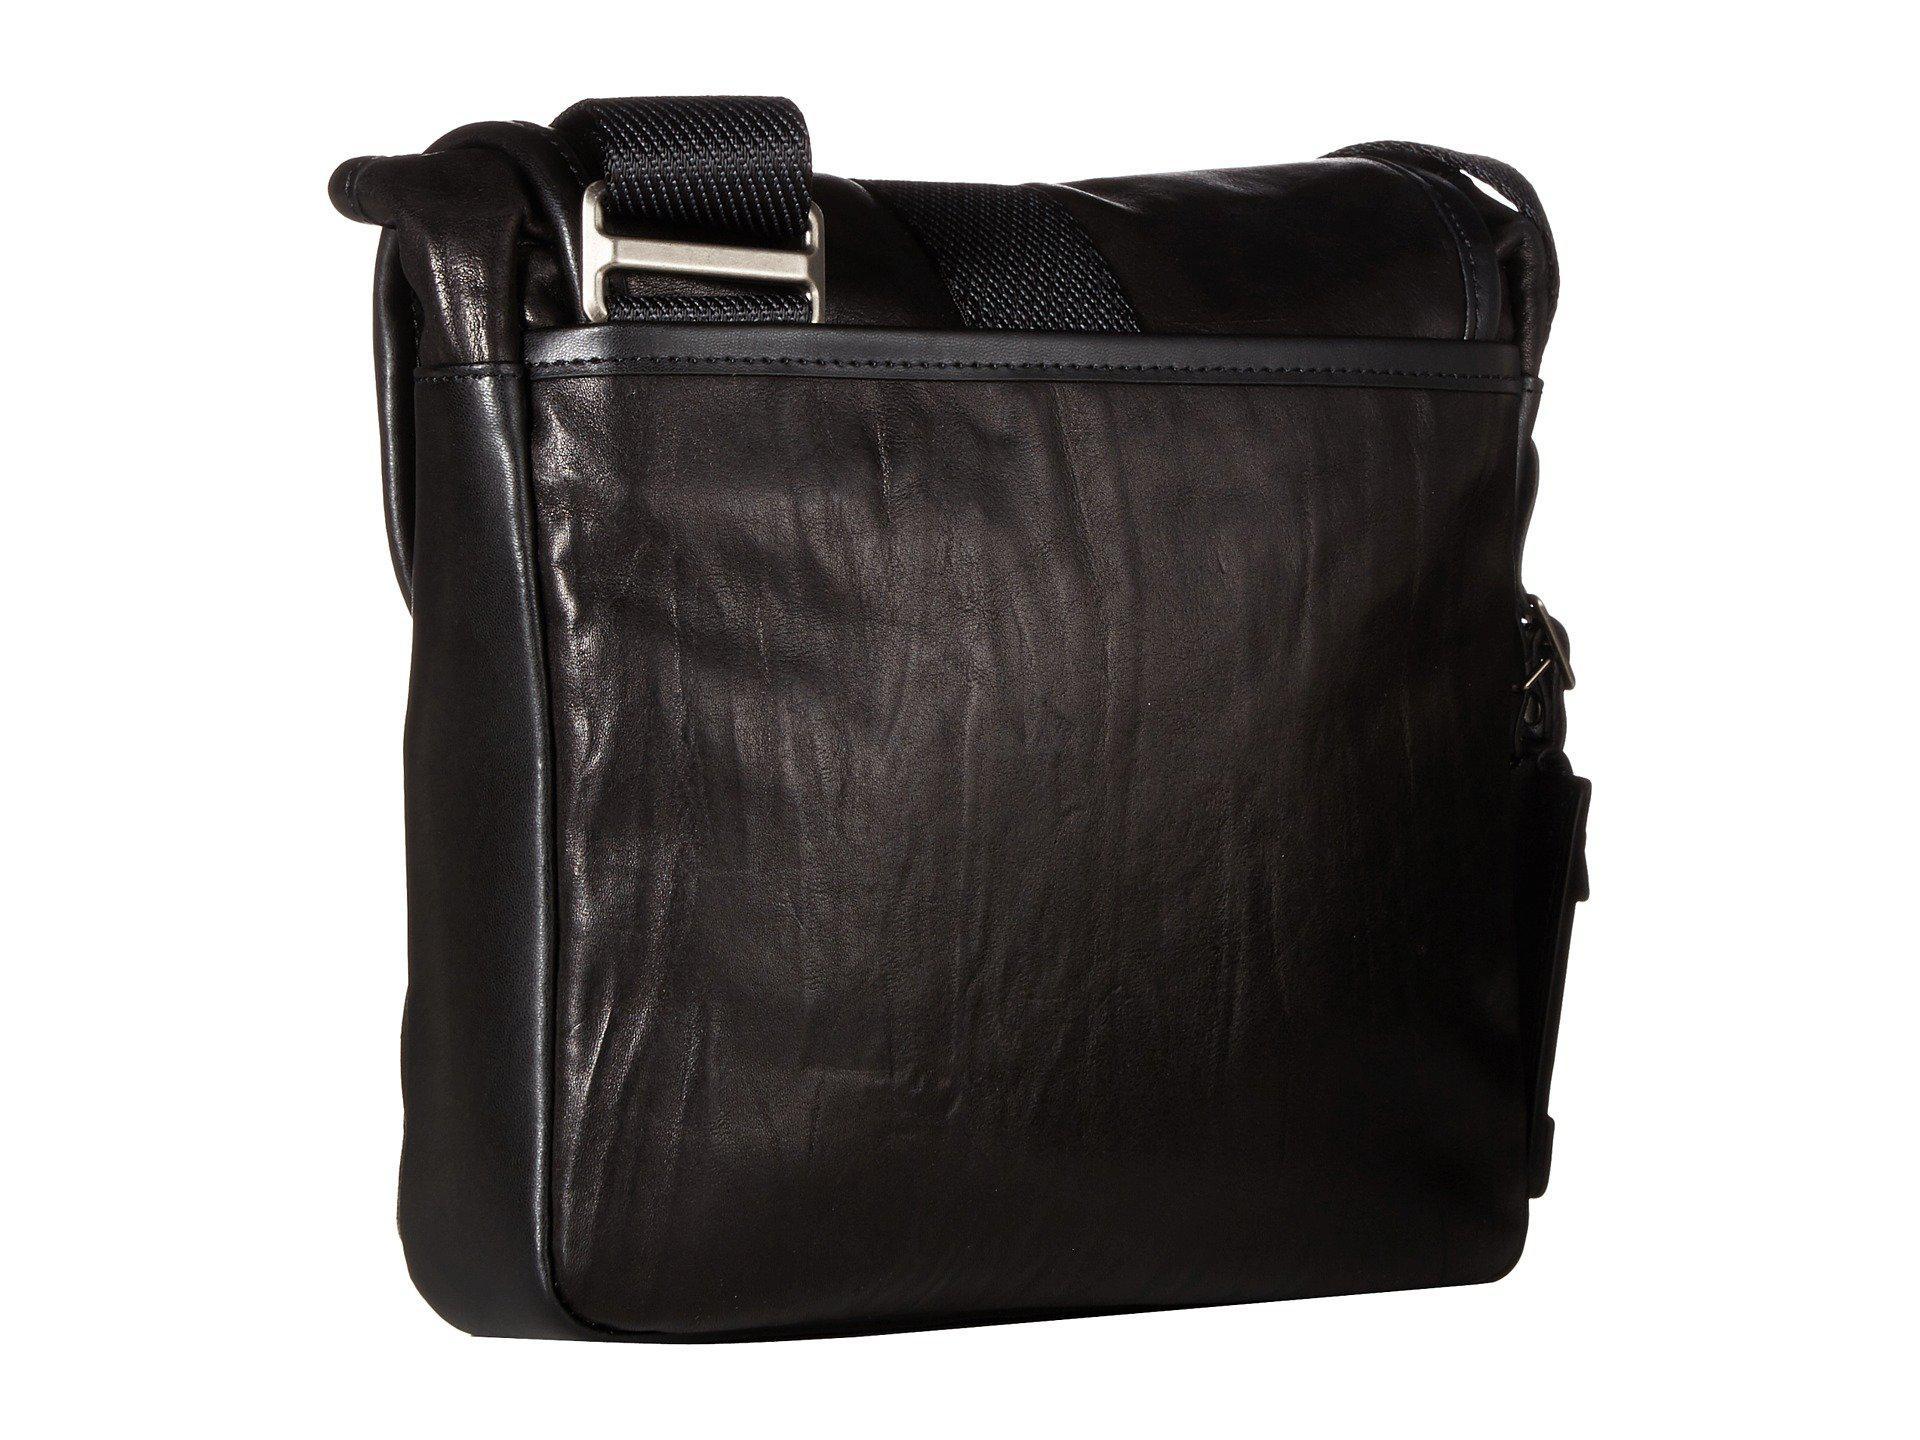 1db1e163c1 Lyst - Tumi Alpha Bravo Barton Leather Crossbody (black Leather ...